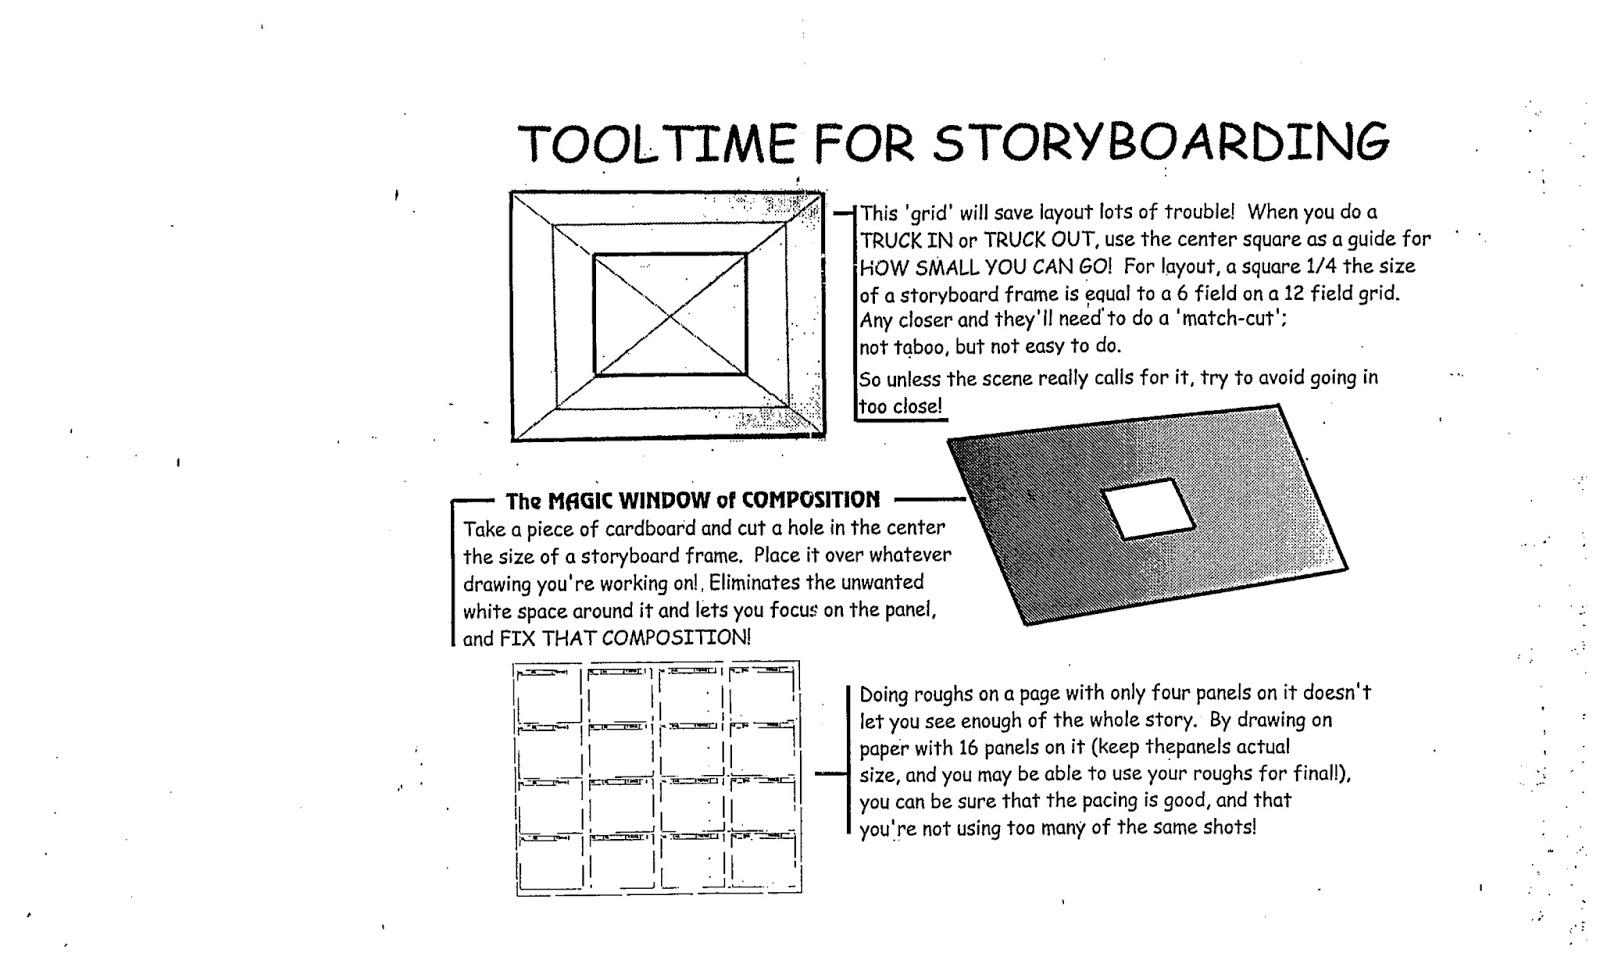 warburtonlabs: STORYBOARDING THE SIMPSONS WAY